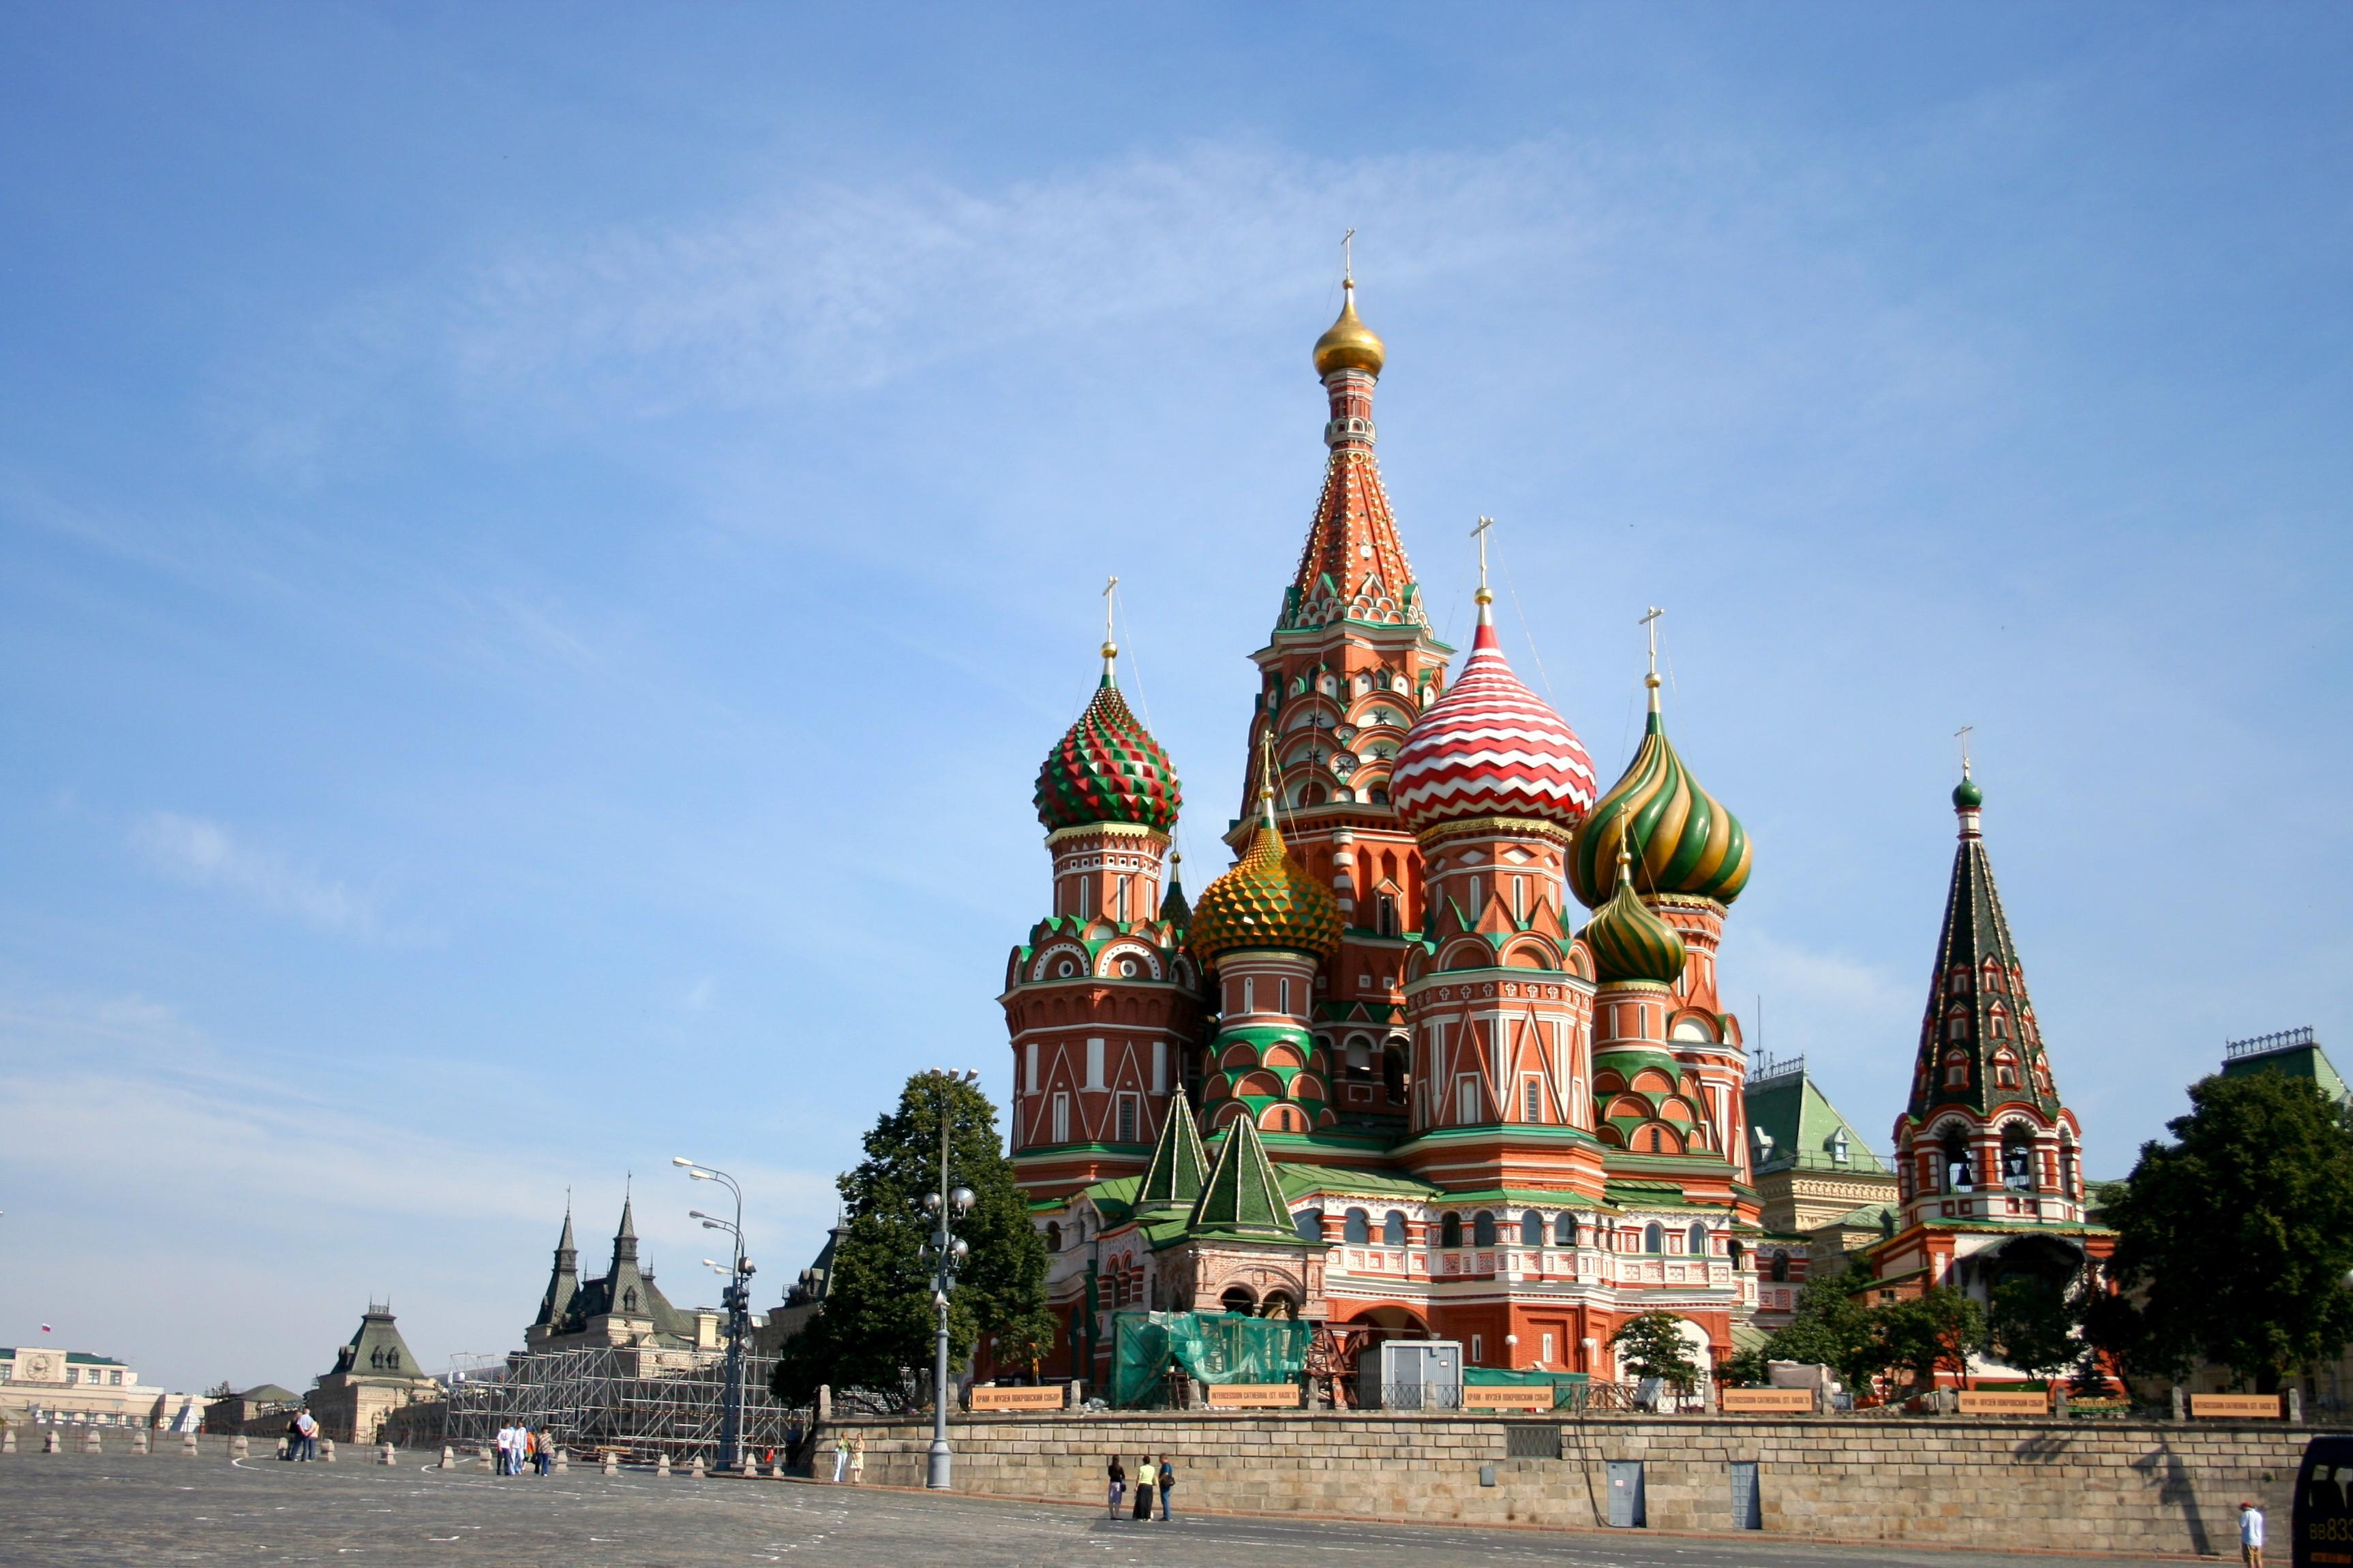 25 foto dal sito di incontri russi Free hook up service India